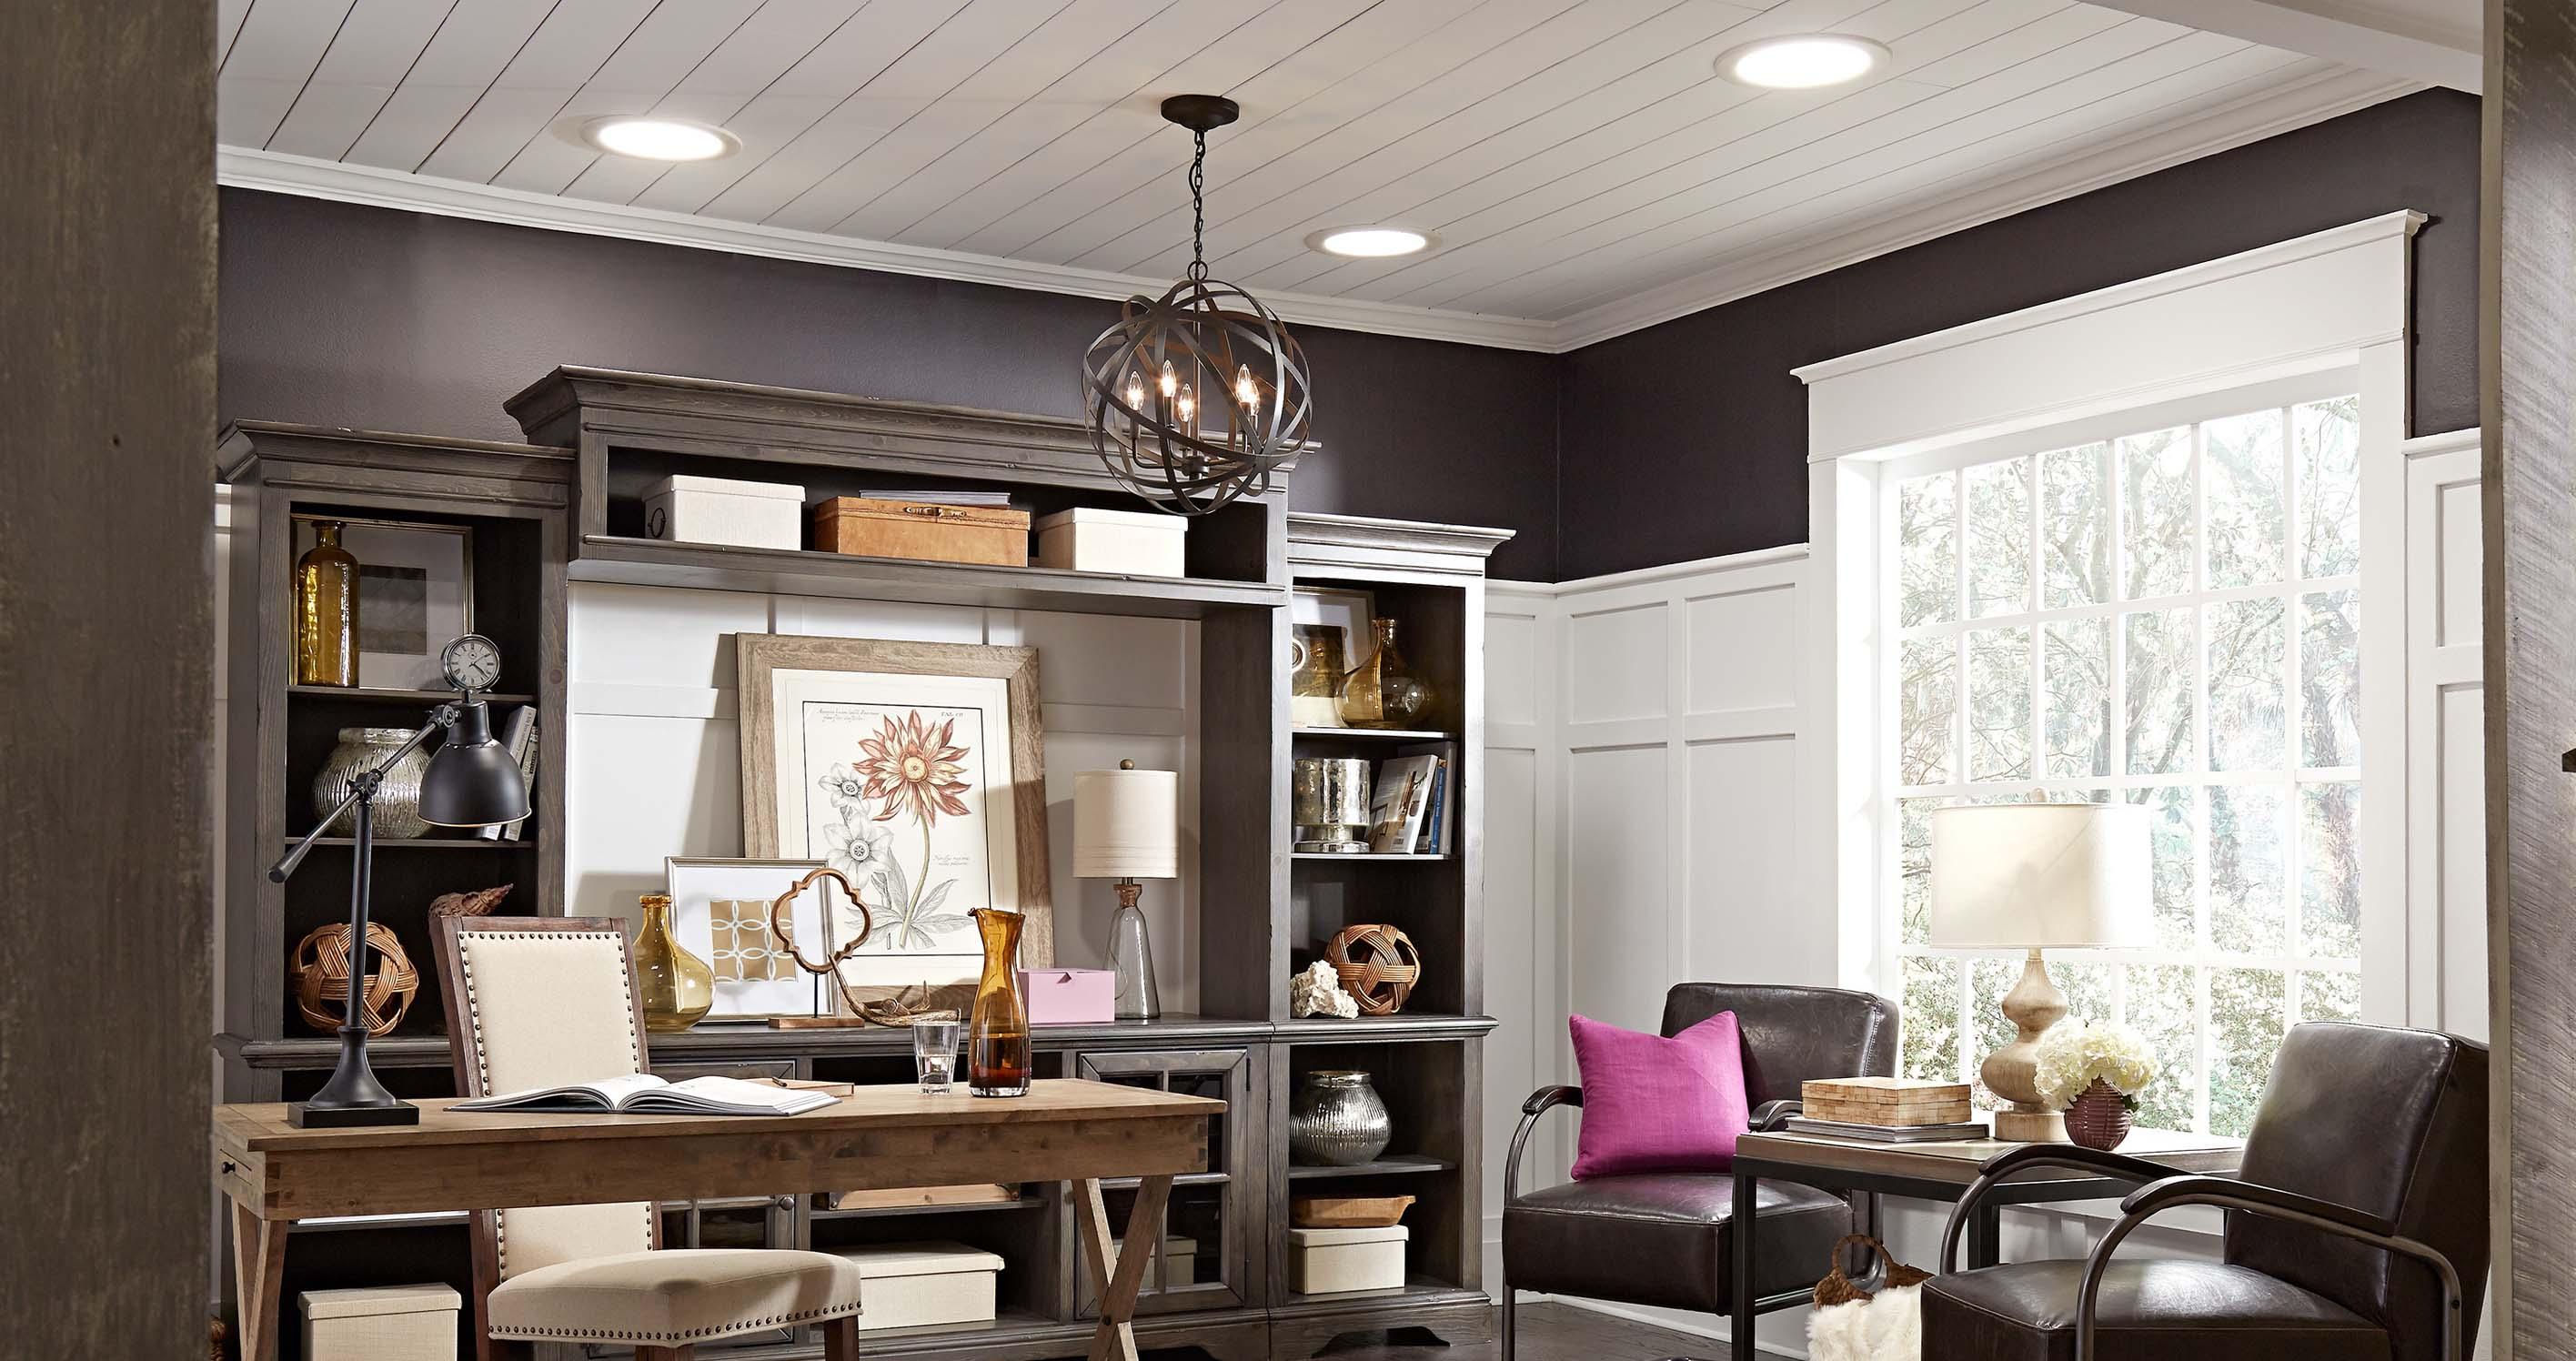 Flex Room Ideas 5 Exciting Ideas For Your Flex Room